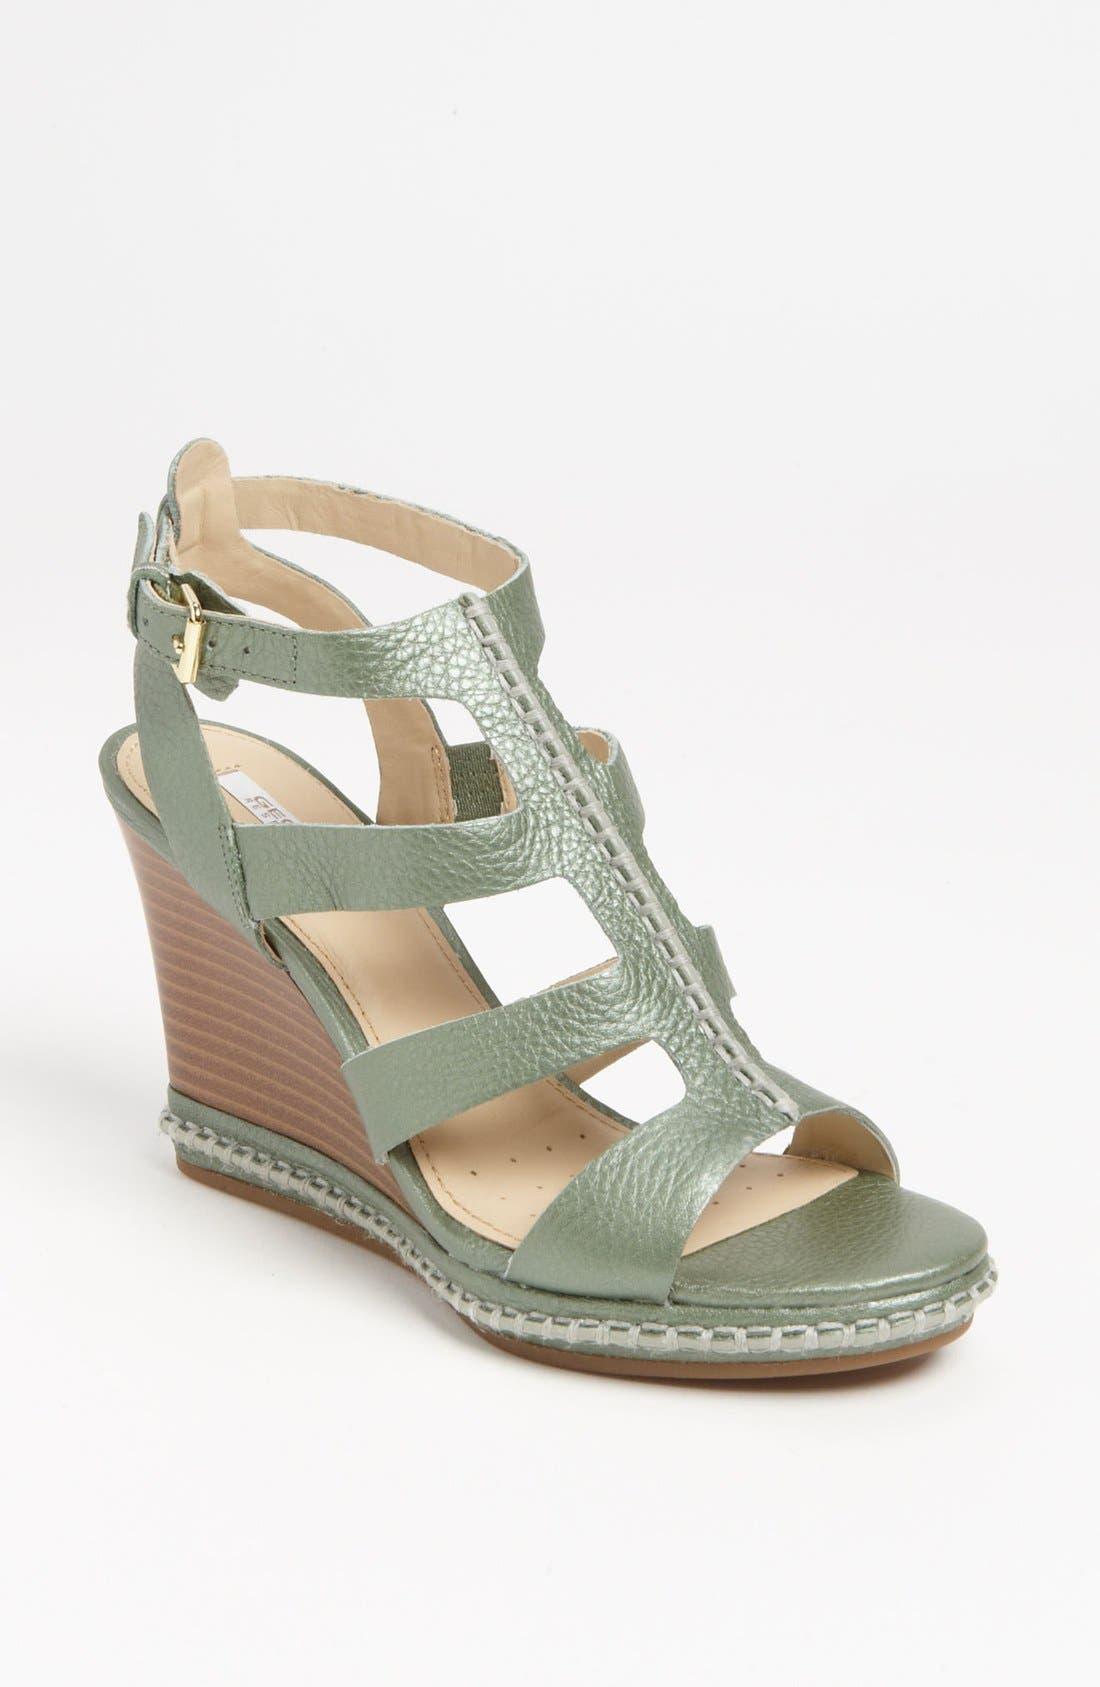 Alternate Image 1 Selected - Geox 'Sibilla' Sandal